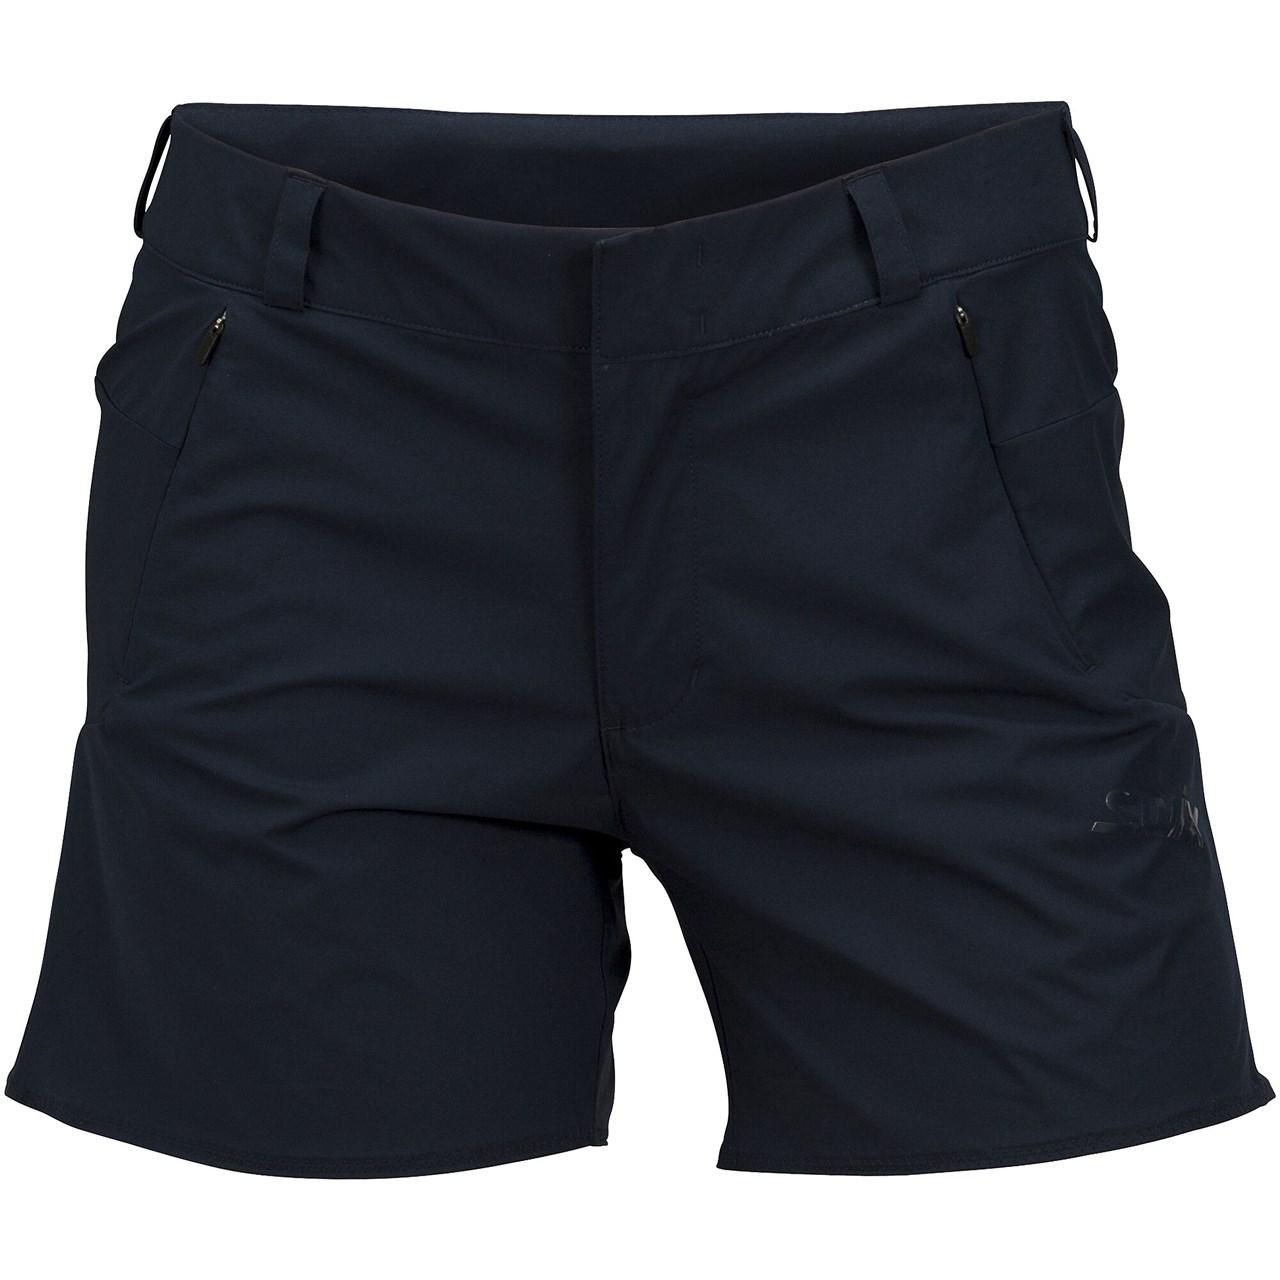 Motion adventure shorts W